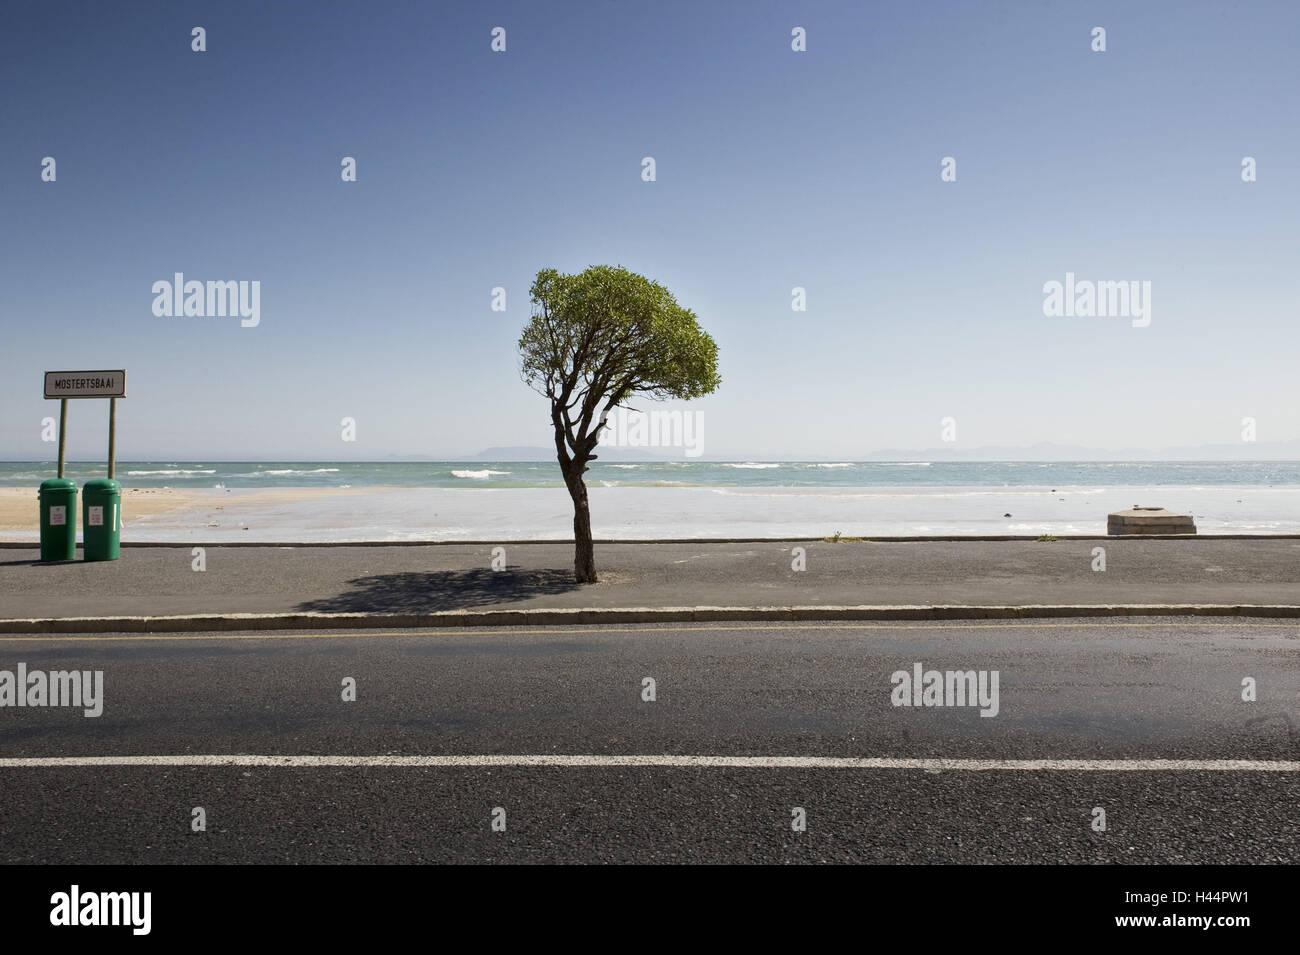 South Africa, Western Cape, Cape Peninsula, False Bay, beach, tree, warped, - Stock Image